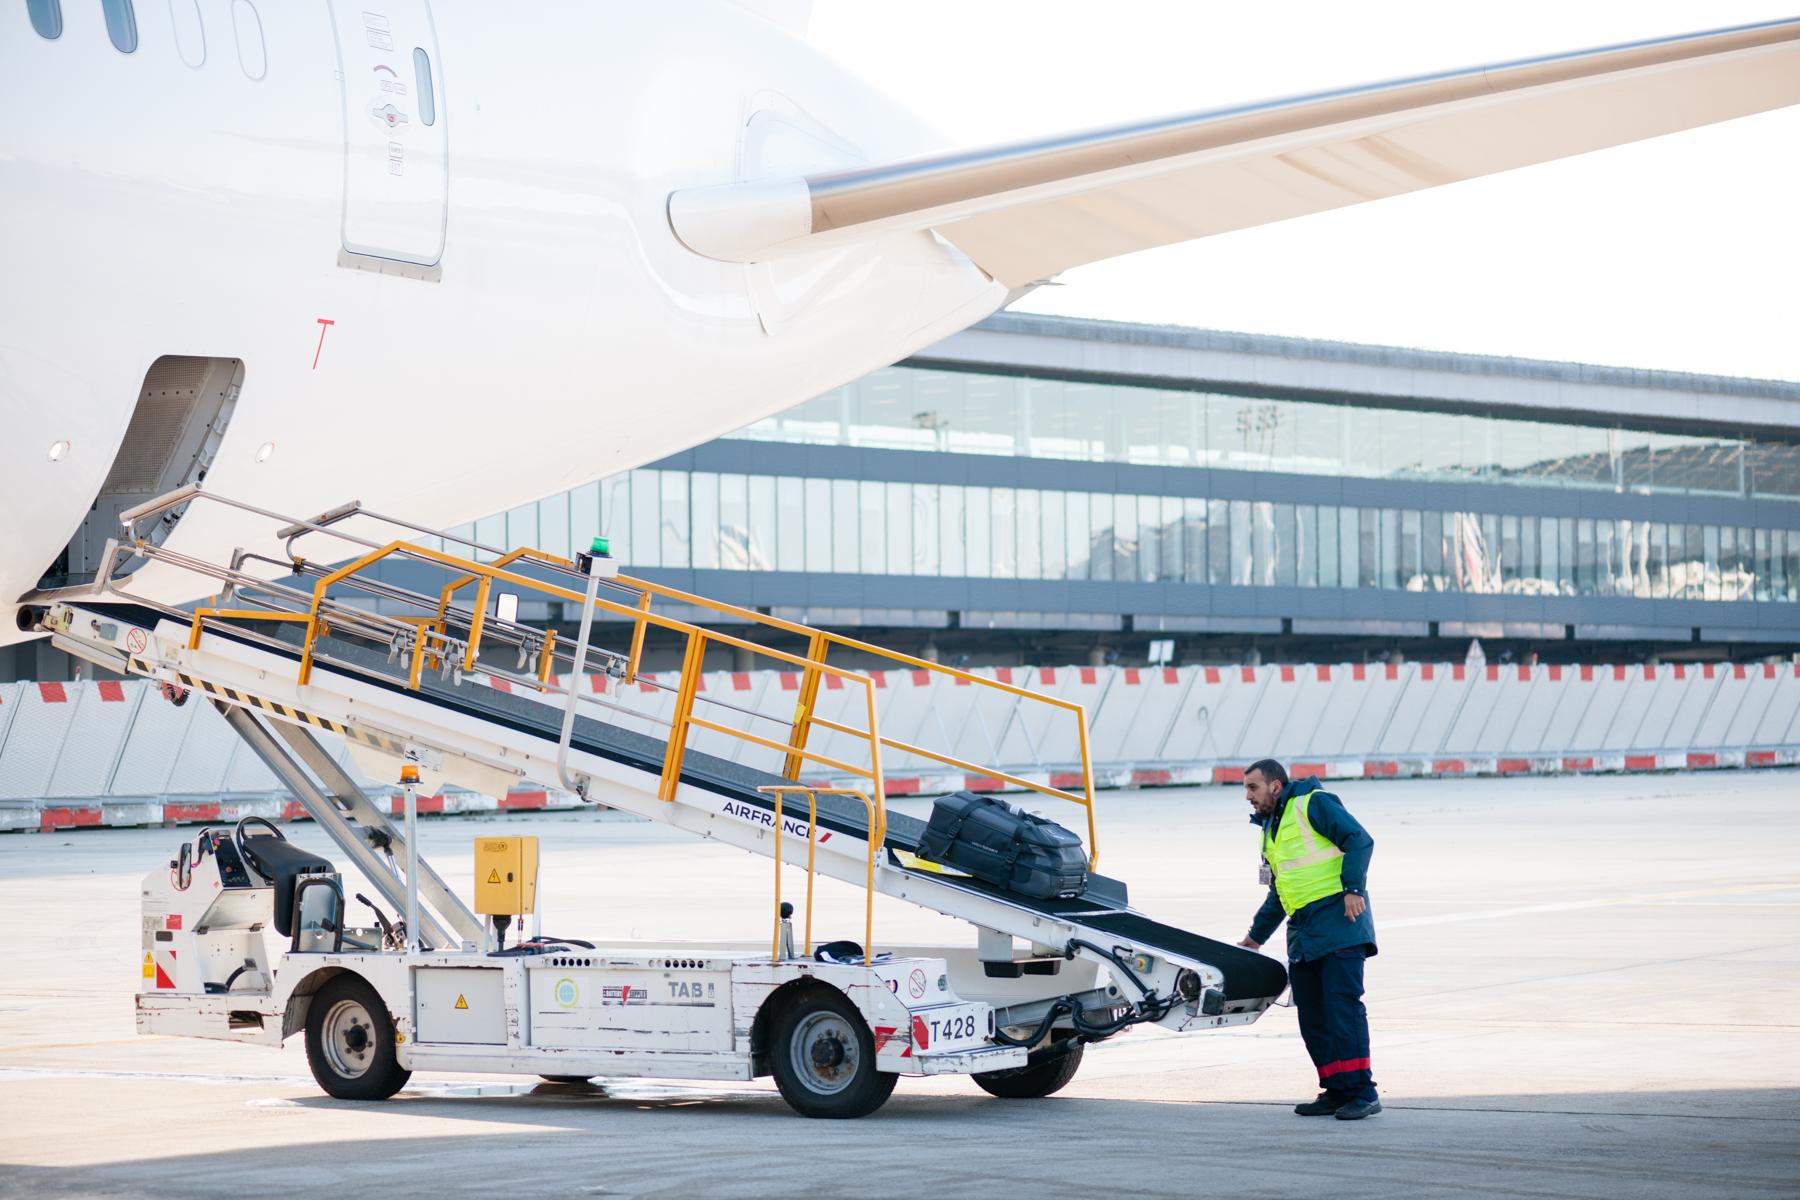 Air France at Work Ramp (4 of 5).jpg